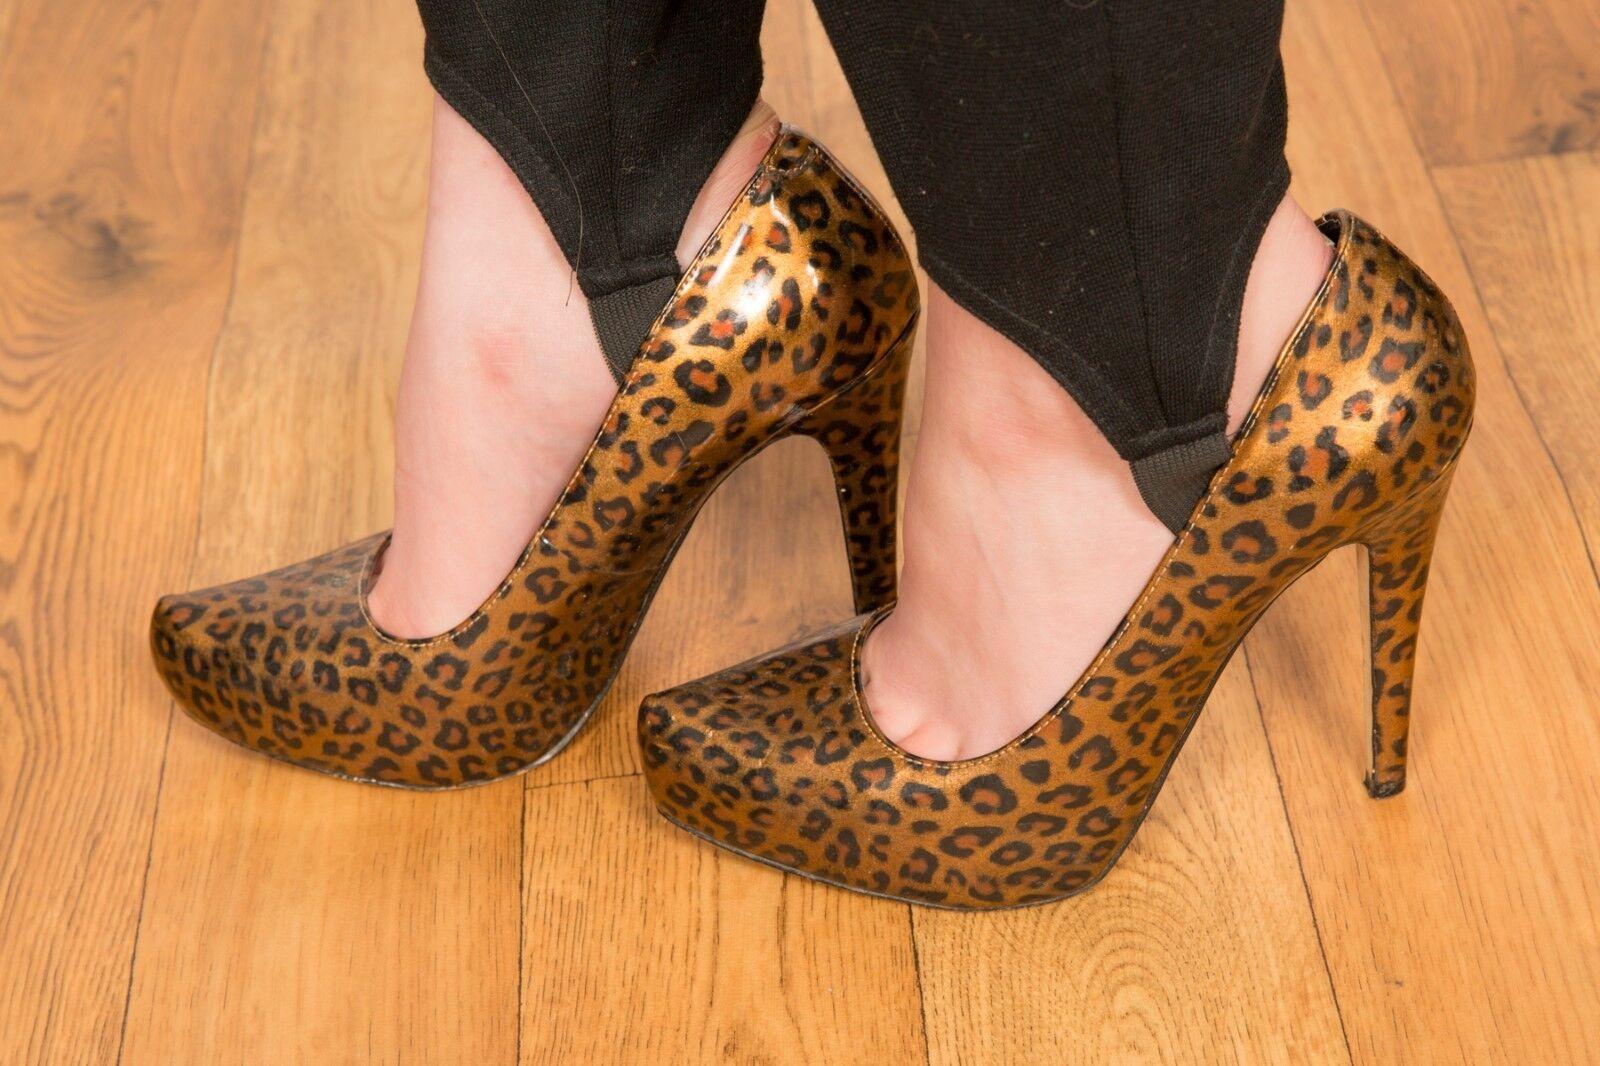 ALDO Leopardprint patent platform heels size 5